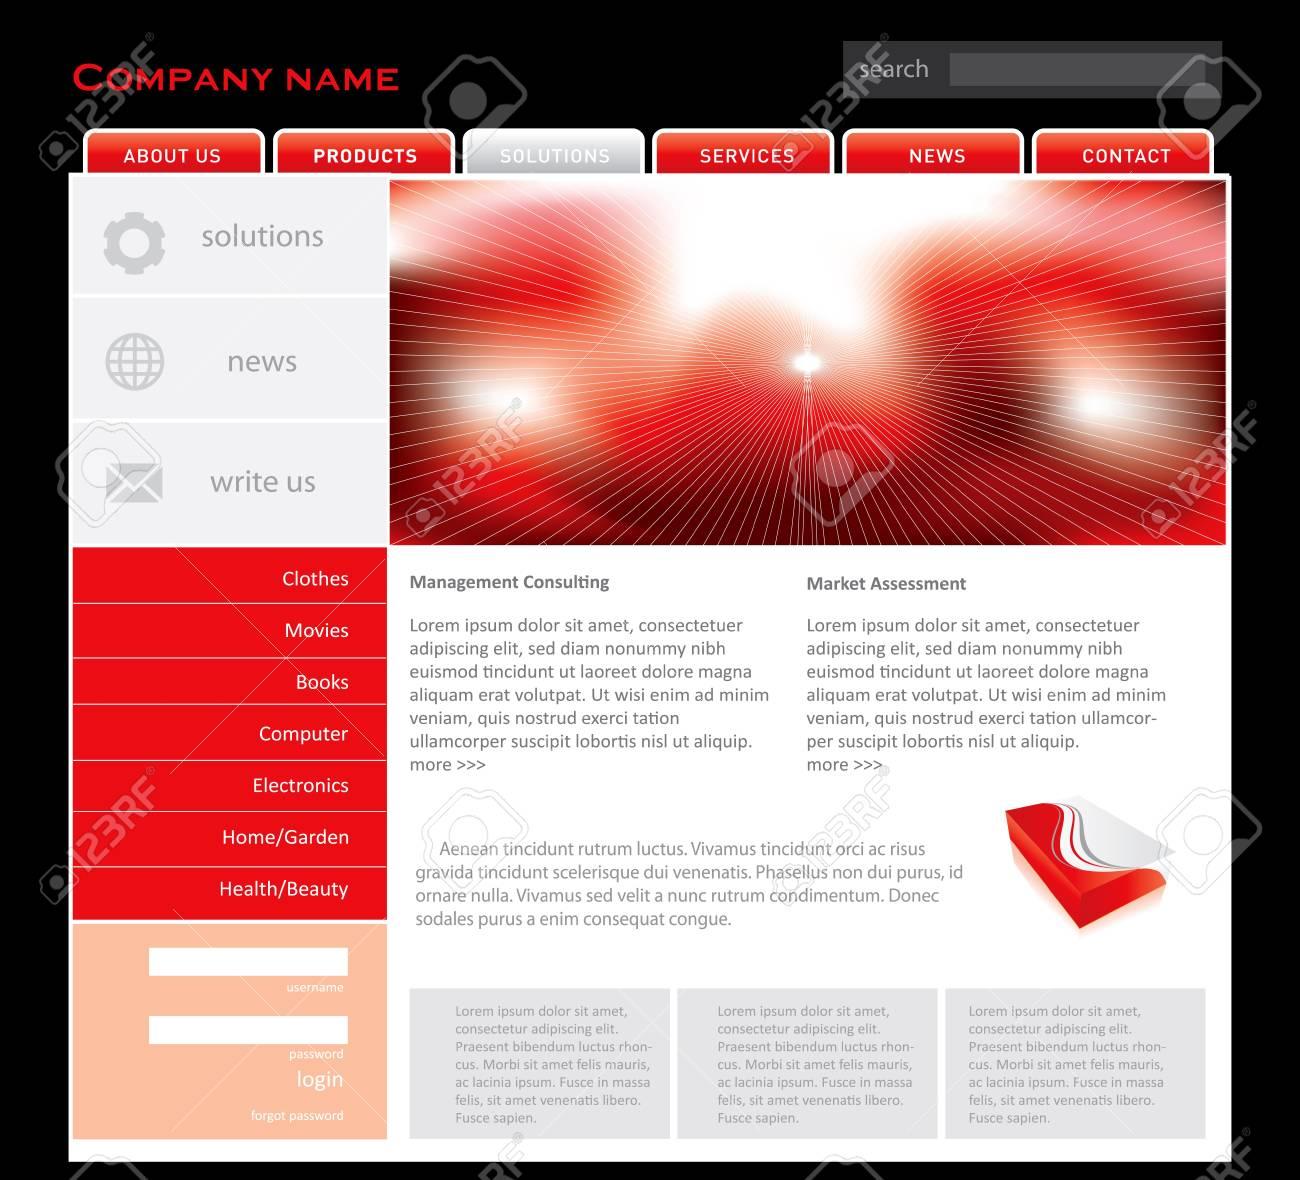 Simple Website Template In Editable Vector Format Royalty Free